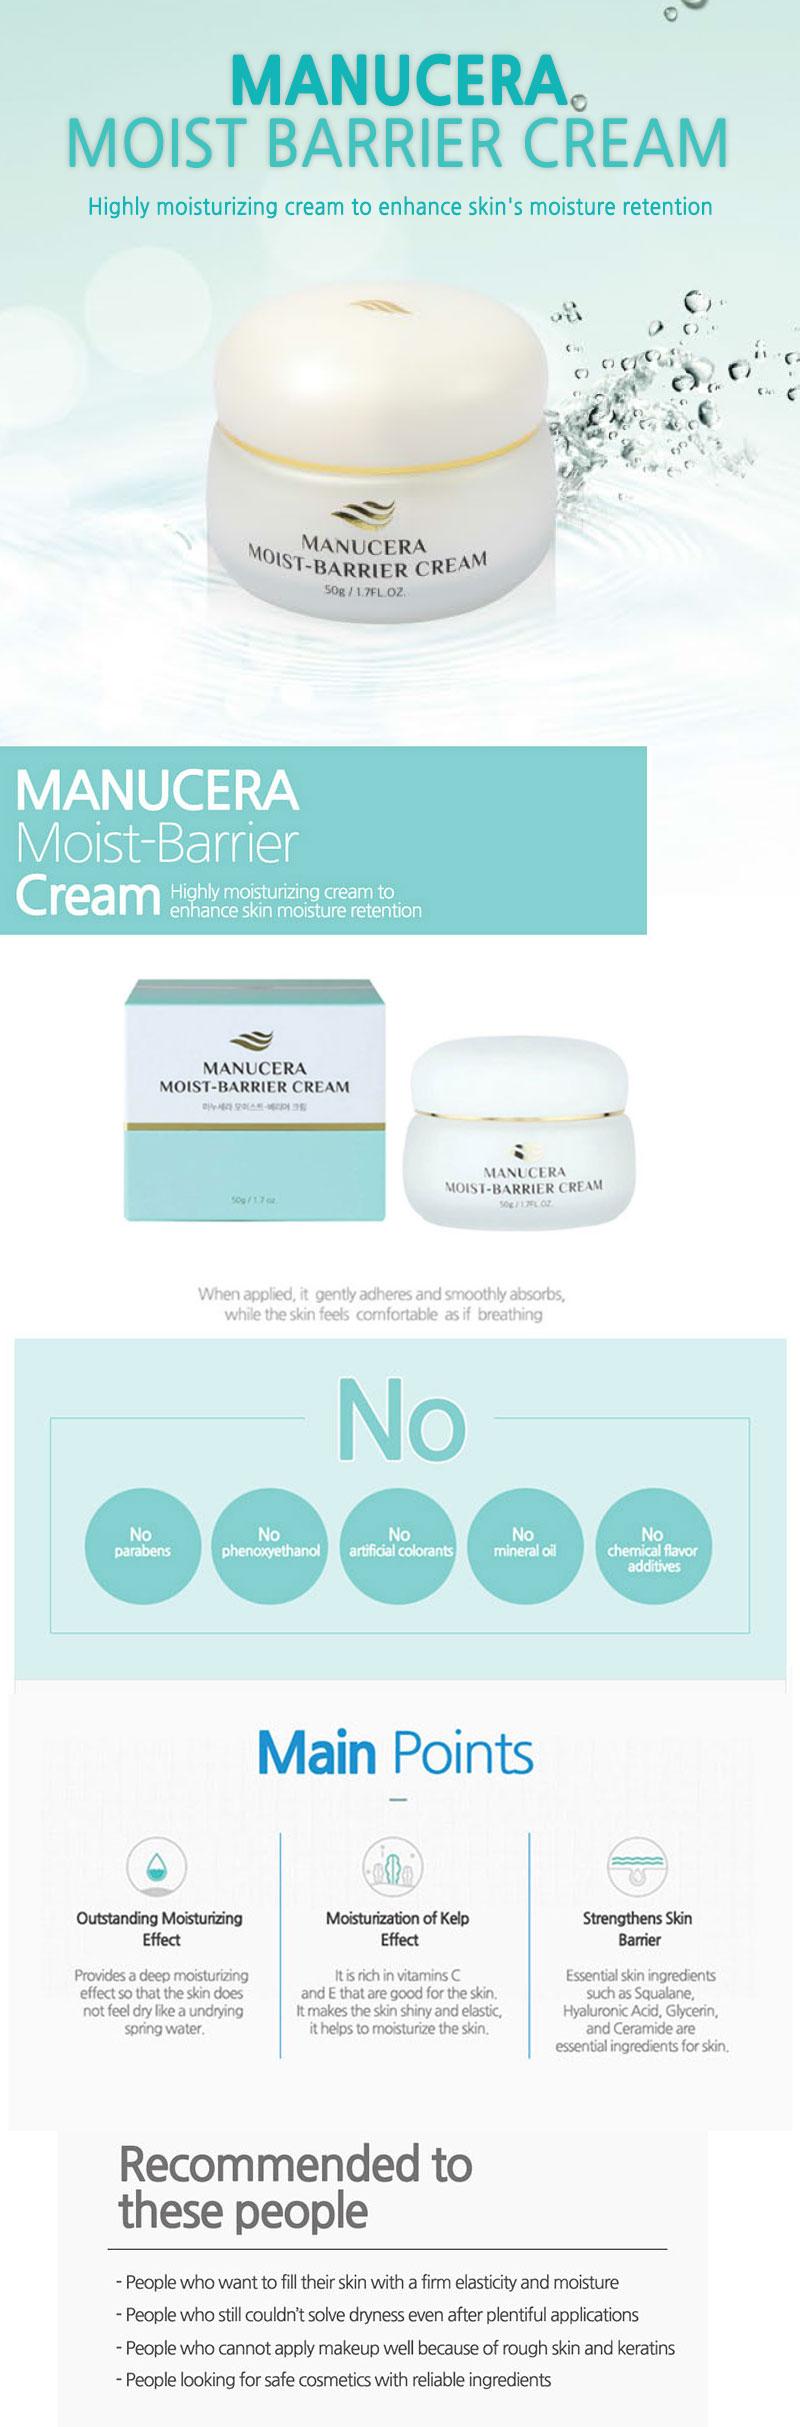 Manucera Cream